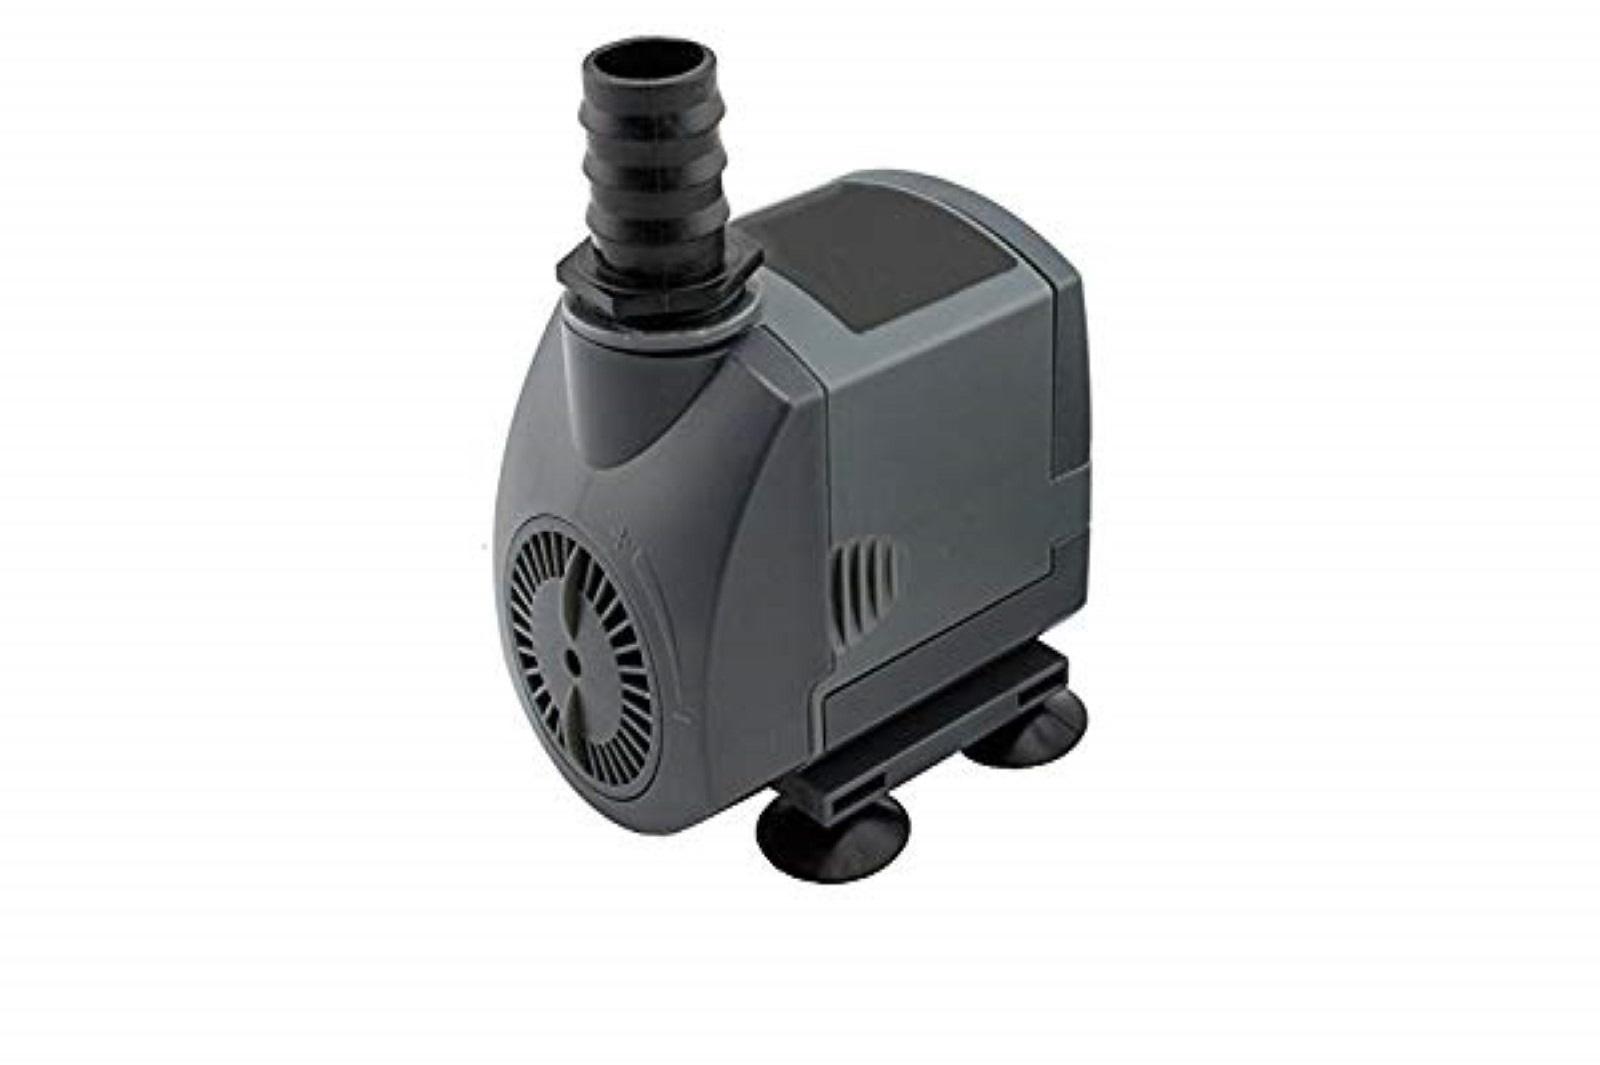 Kerry Electronics Wasserspielpumpe kep0750l, 750l/h, 230V